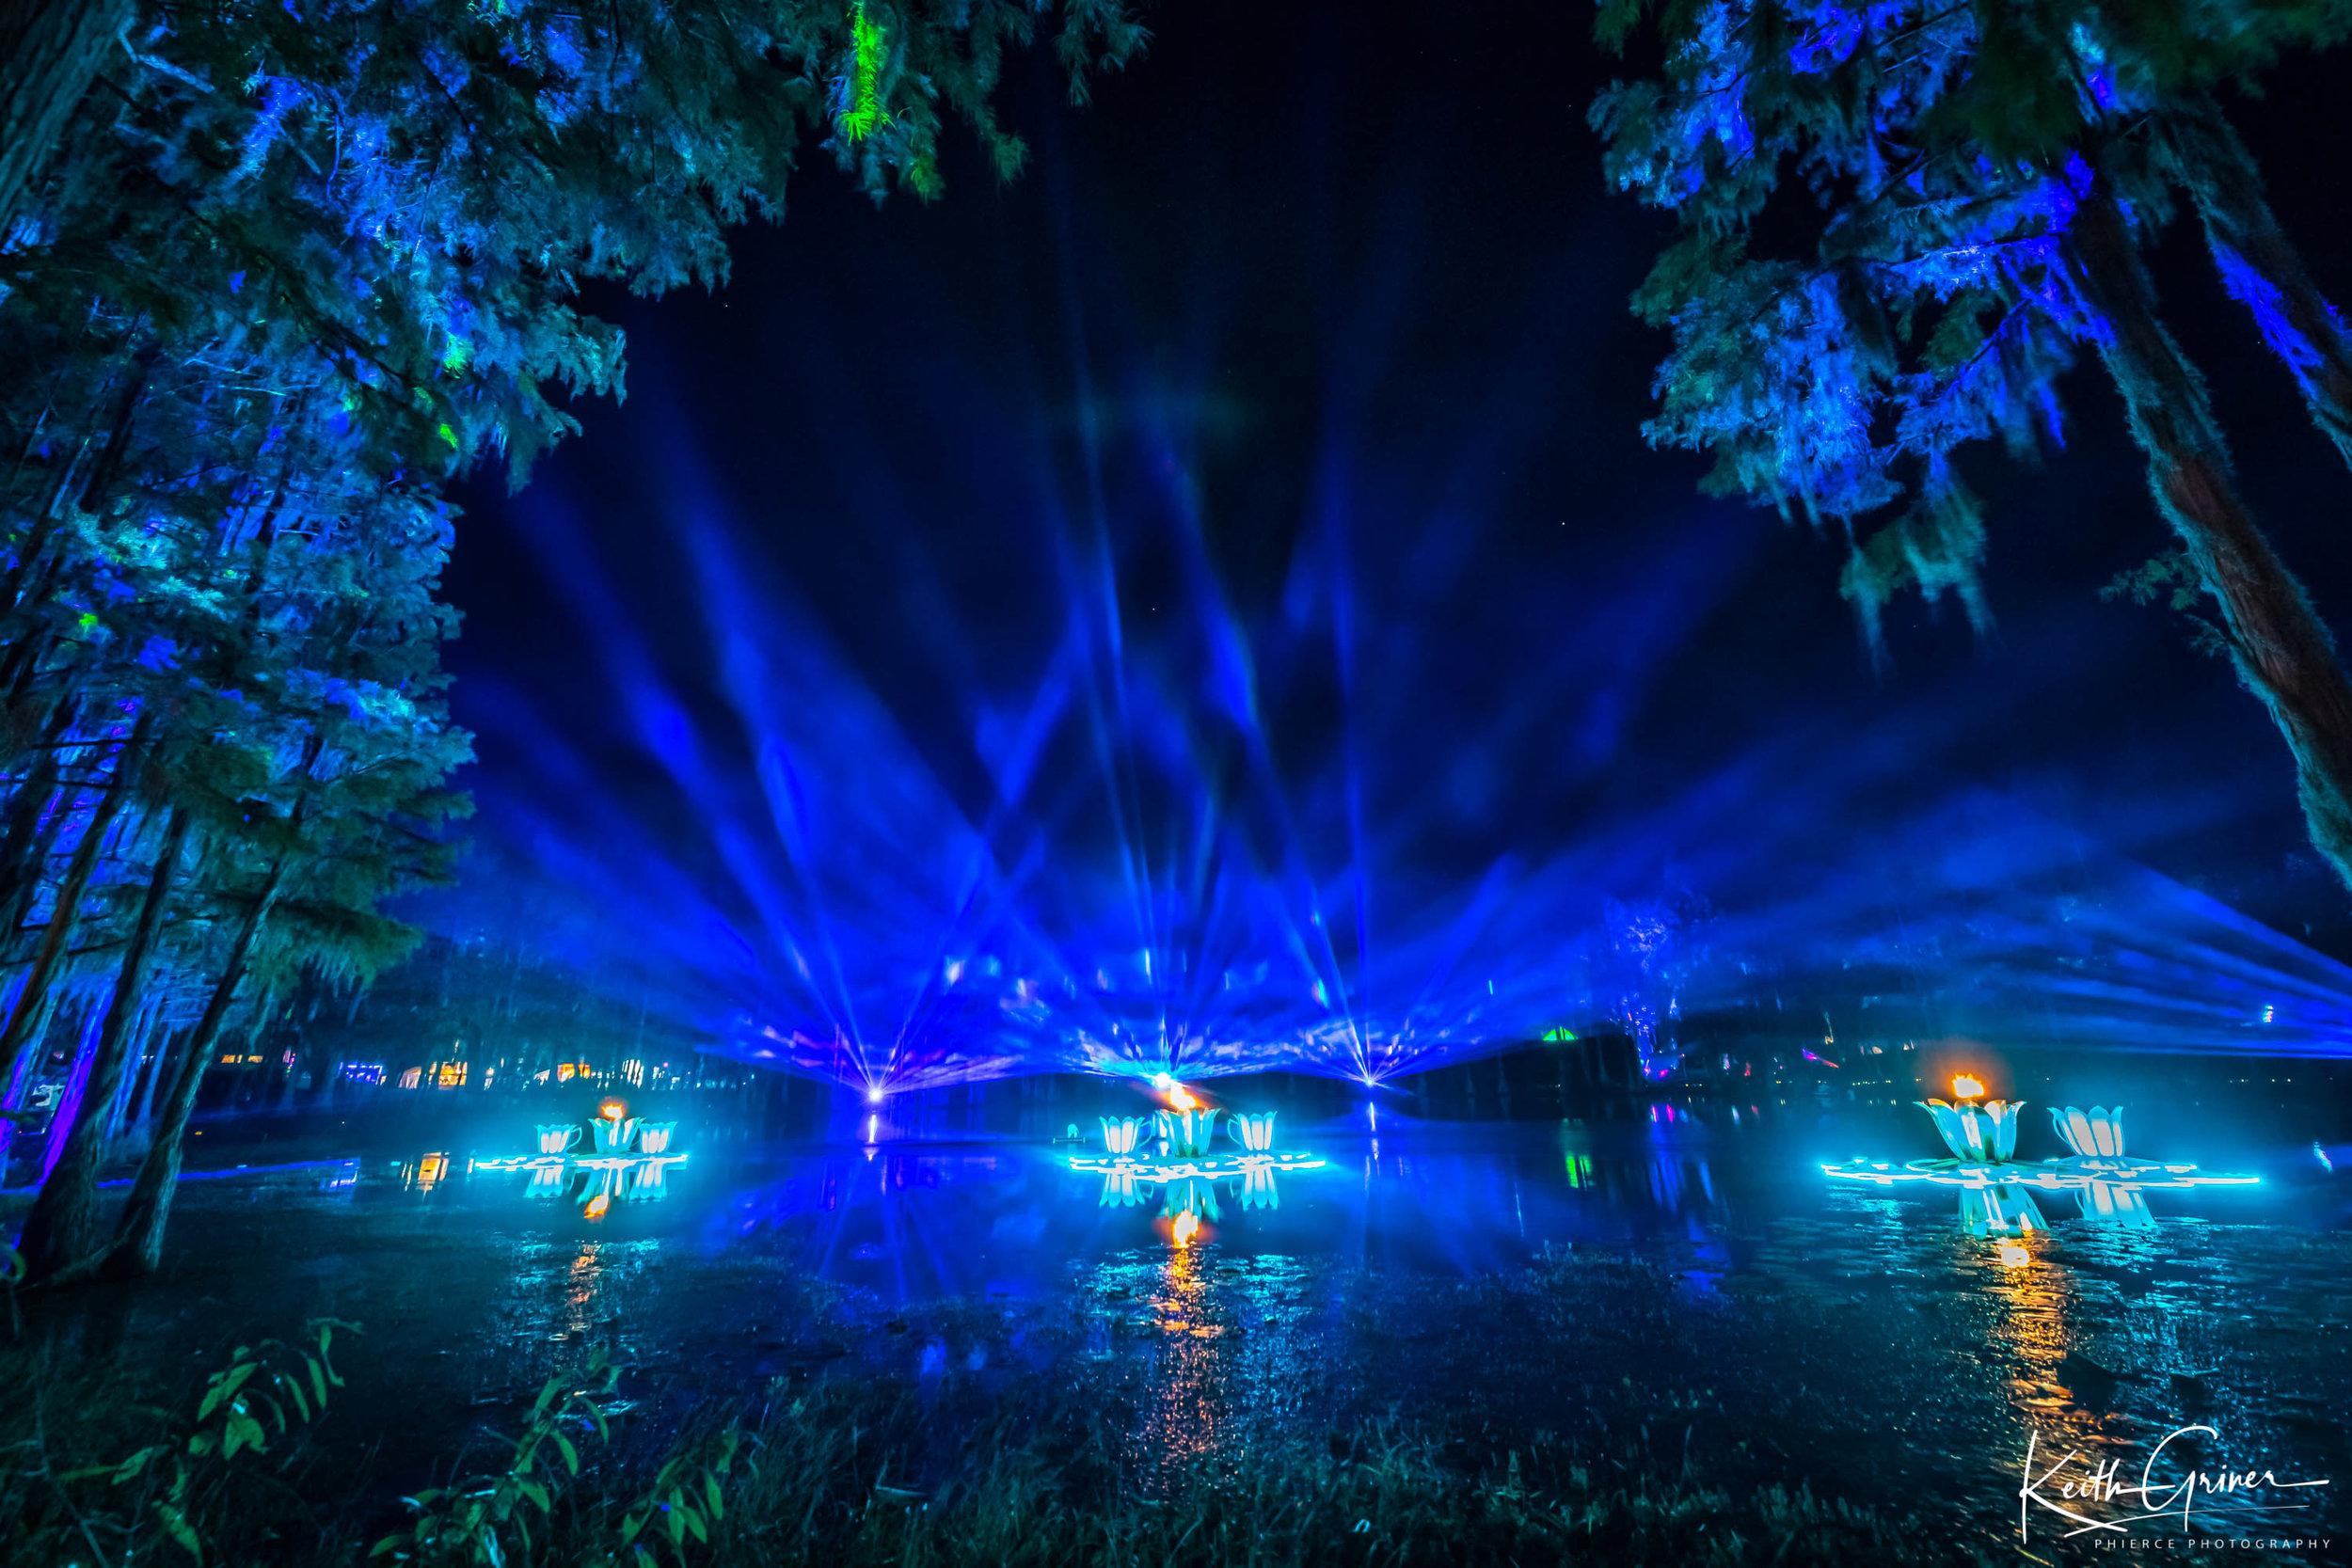 Hula_Spirit Lake_by Keith Griner 0D5_3069-Edit.jpg